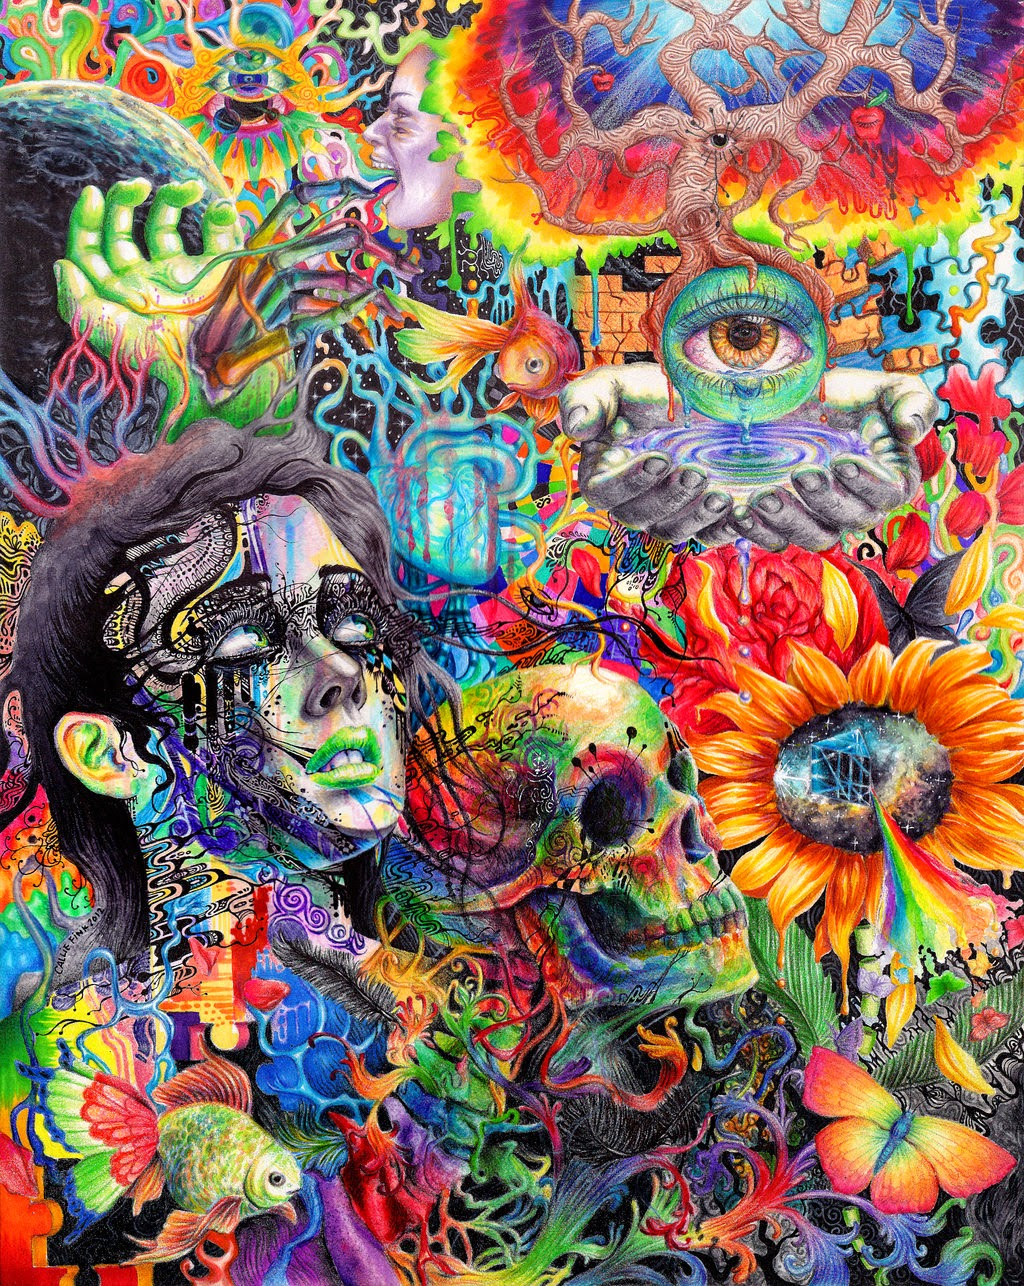 lsd hallucinations wallpaper 64802 imgflash